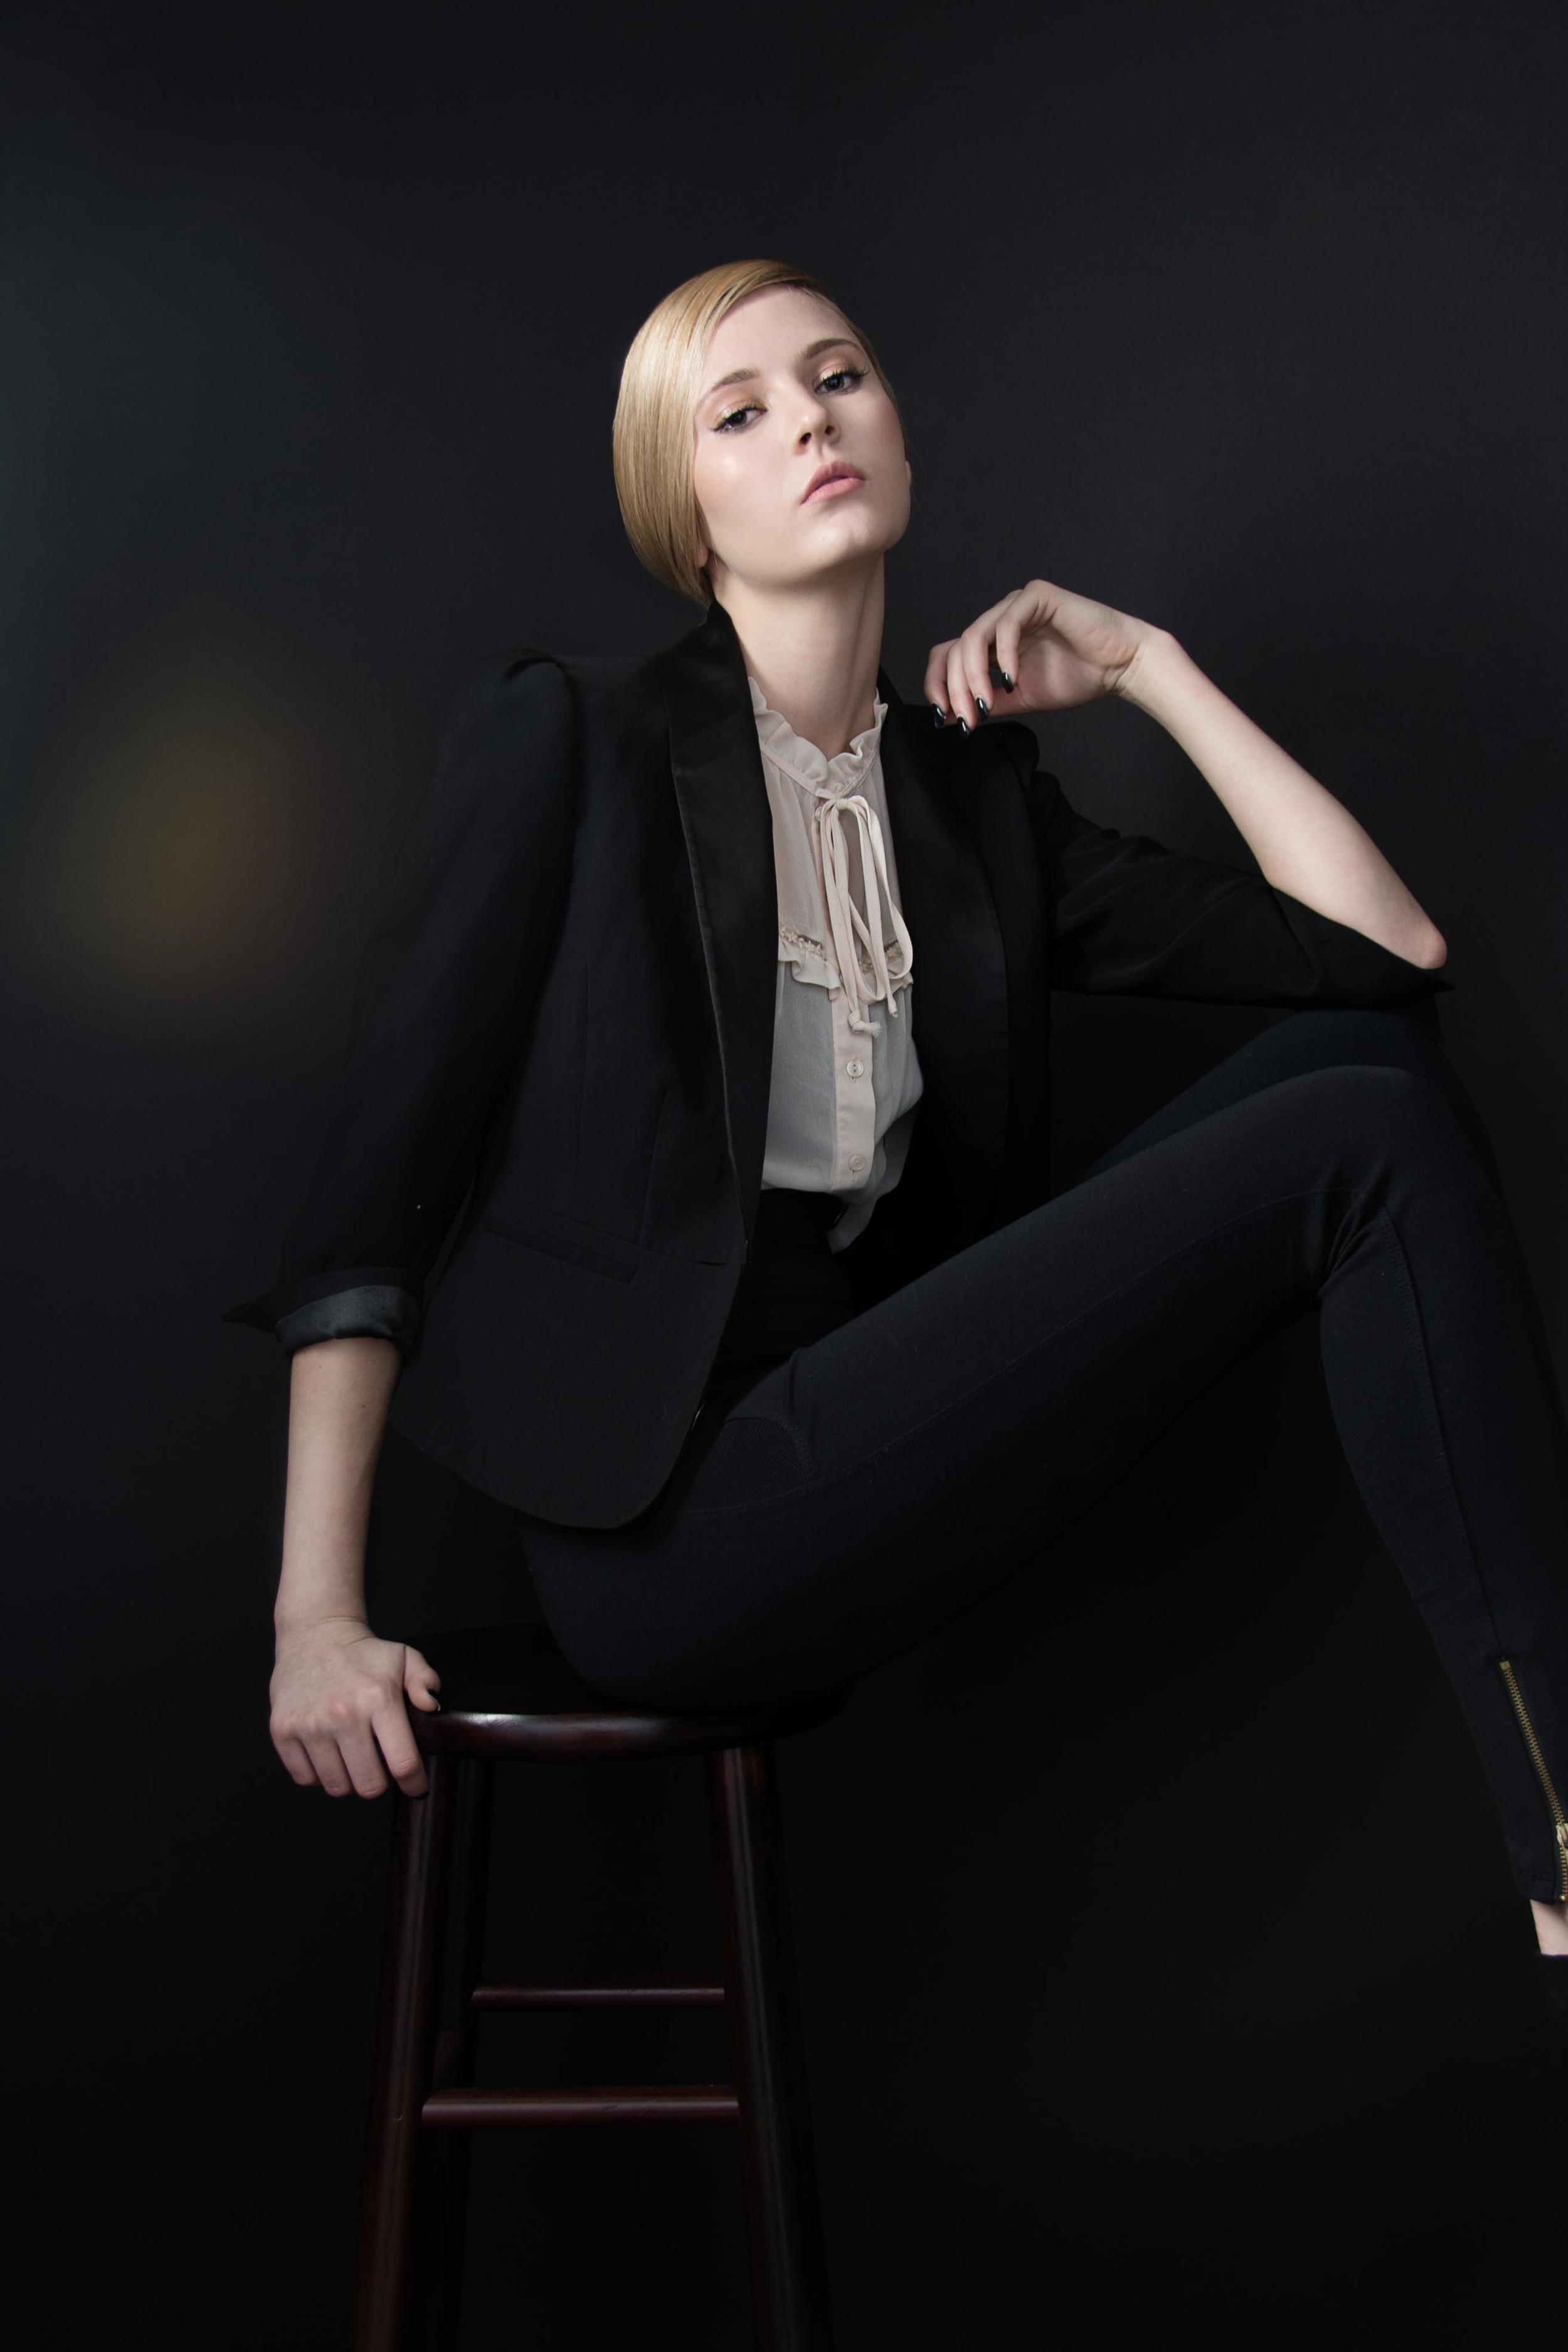 Nordstrom Studio N Fashion Photographer